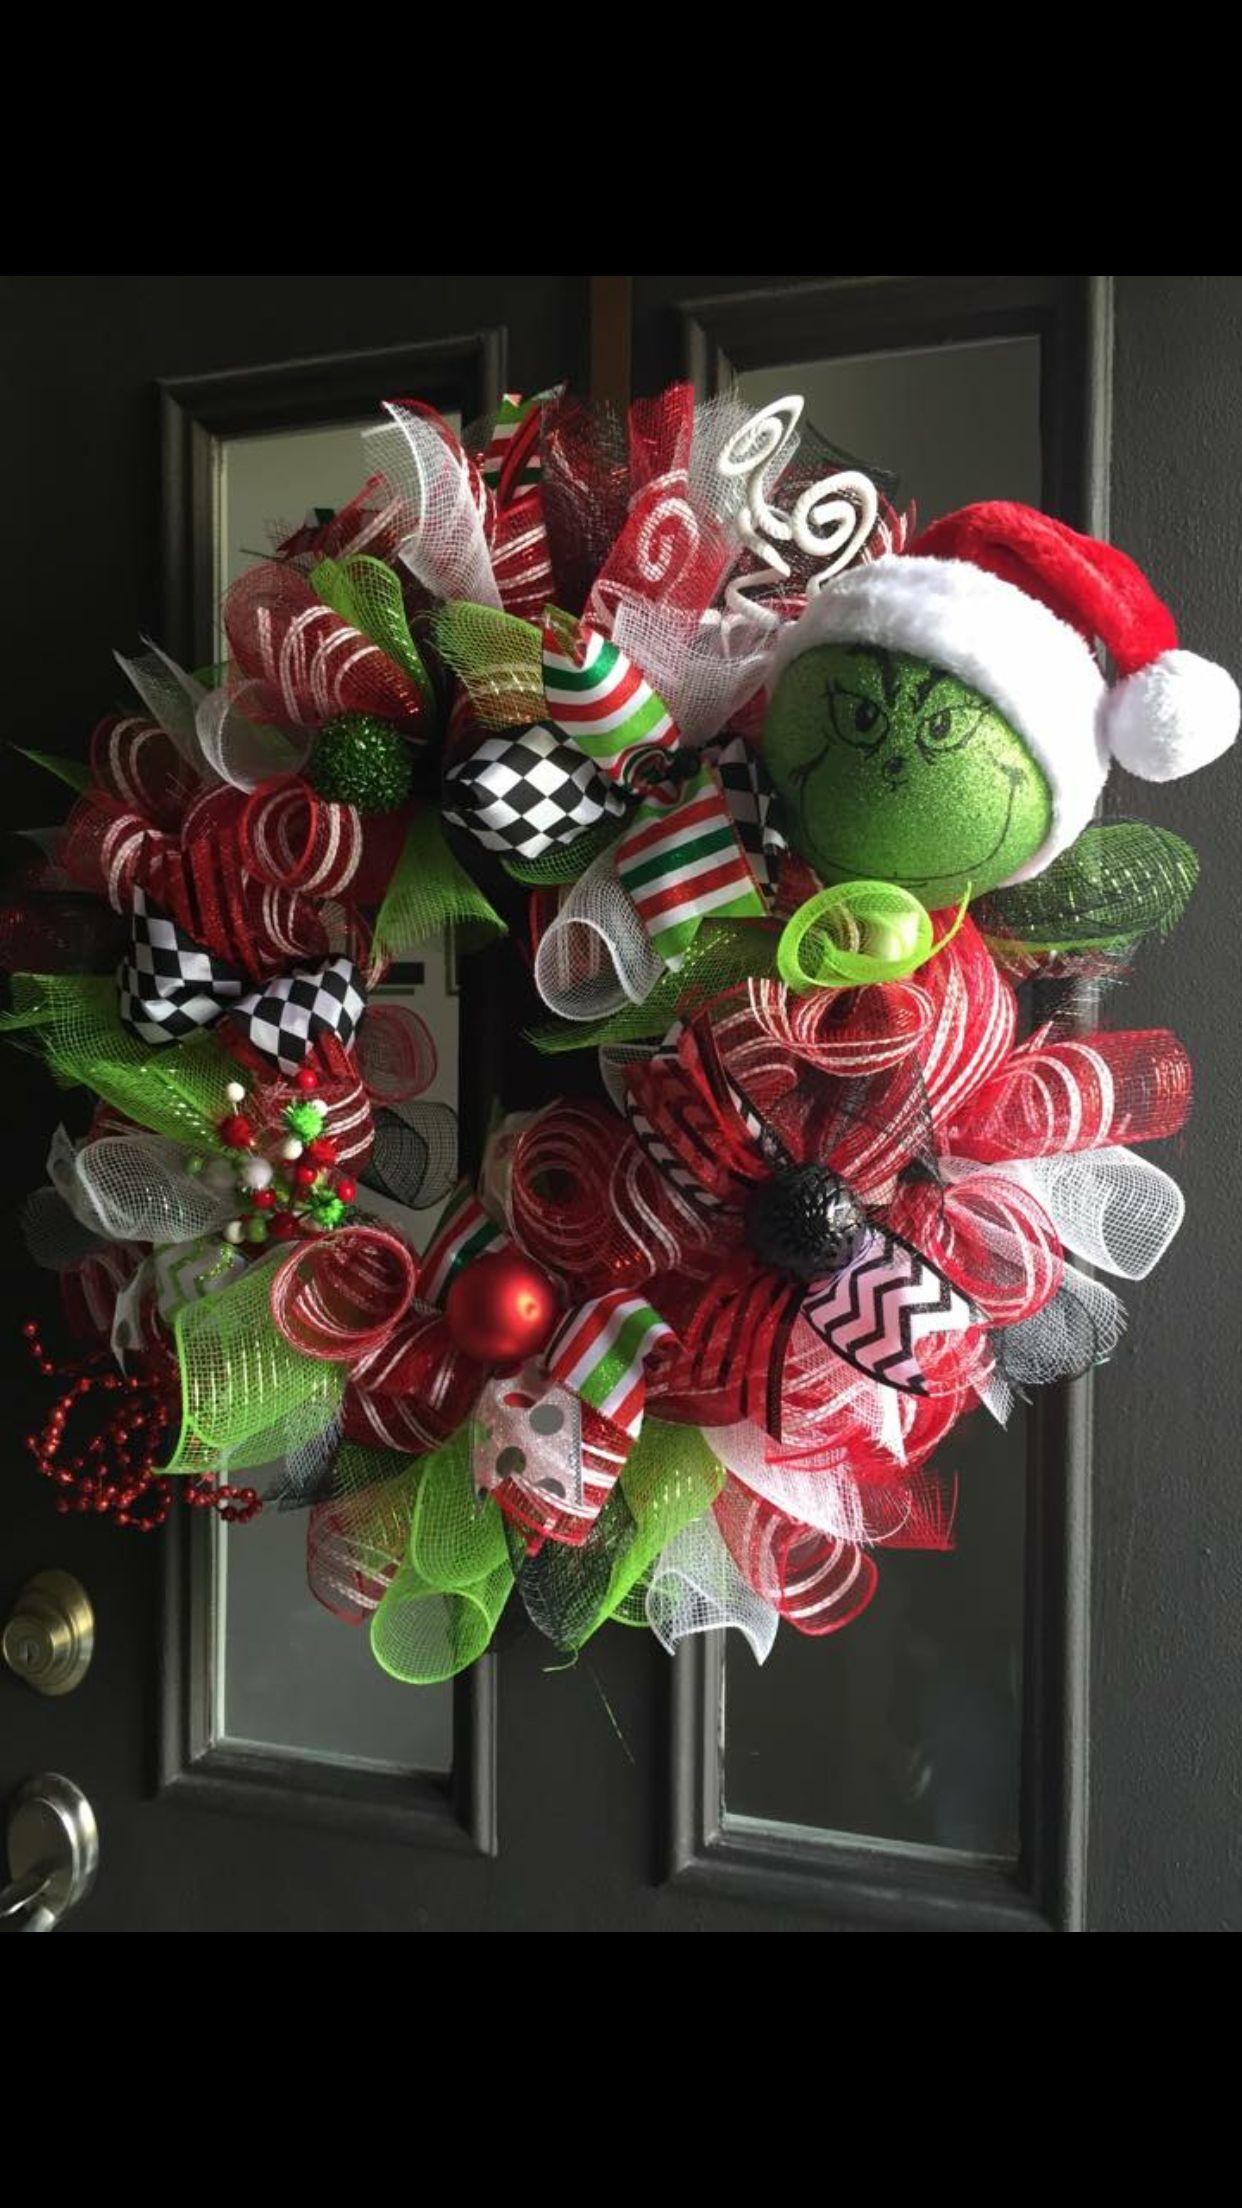 Fiber optic christmas snowman wreath decoration - Grinch Wreath